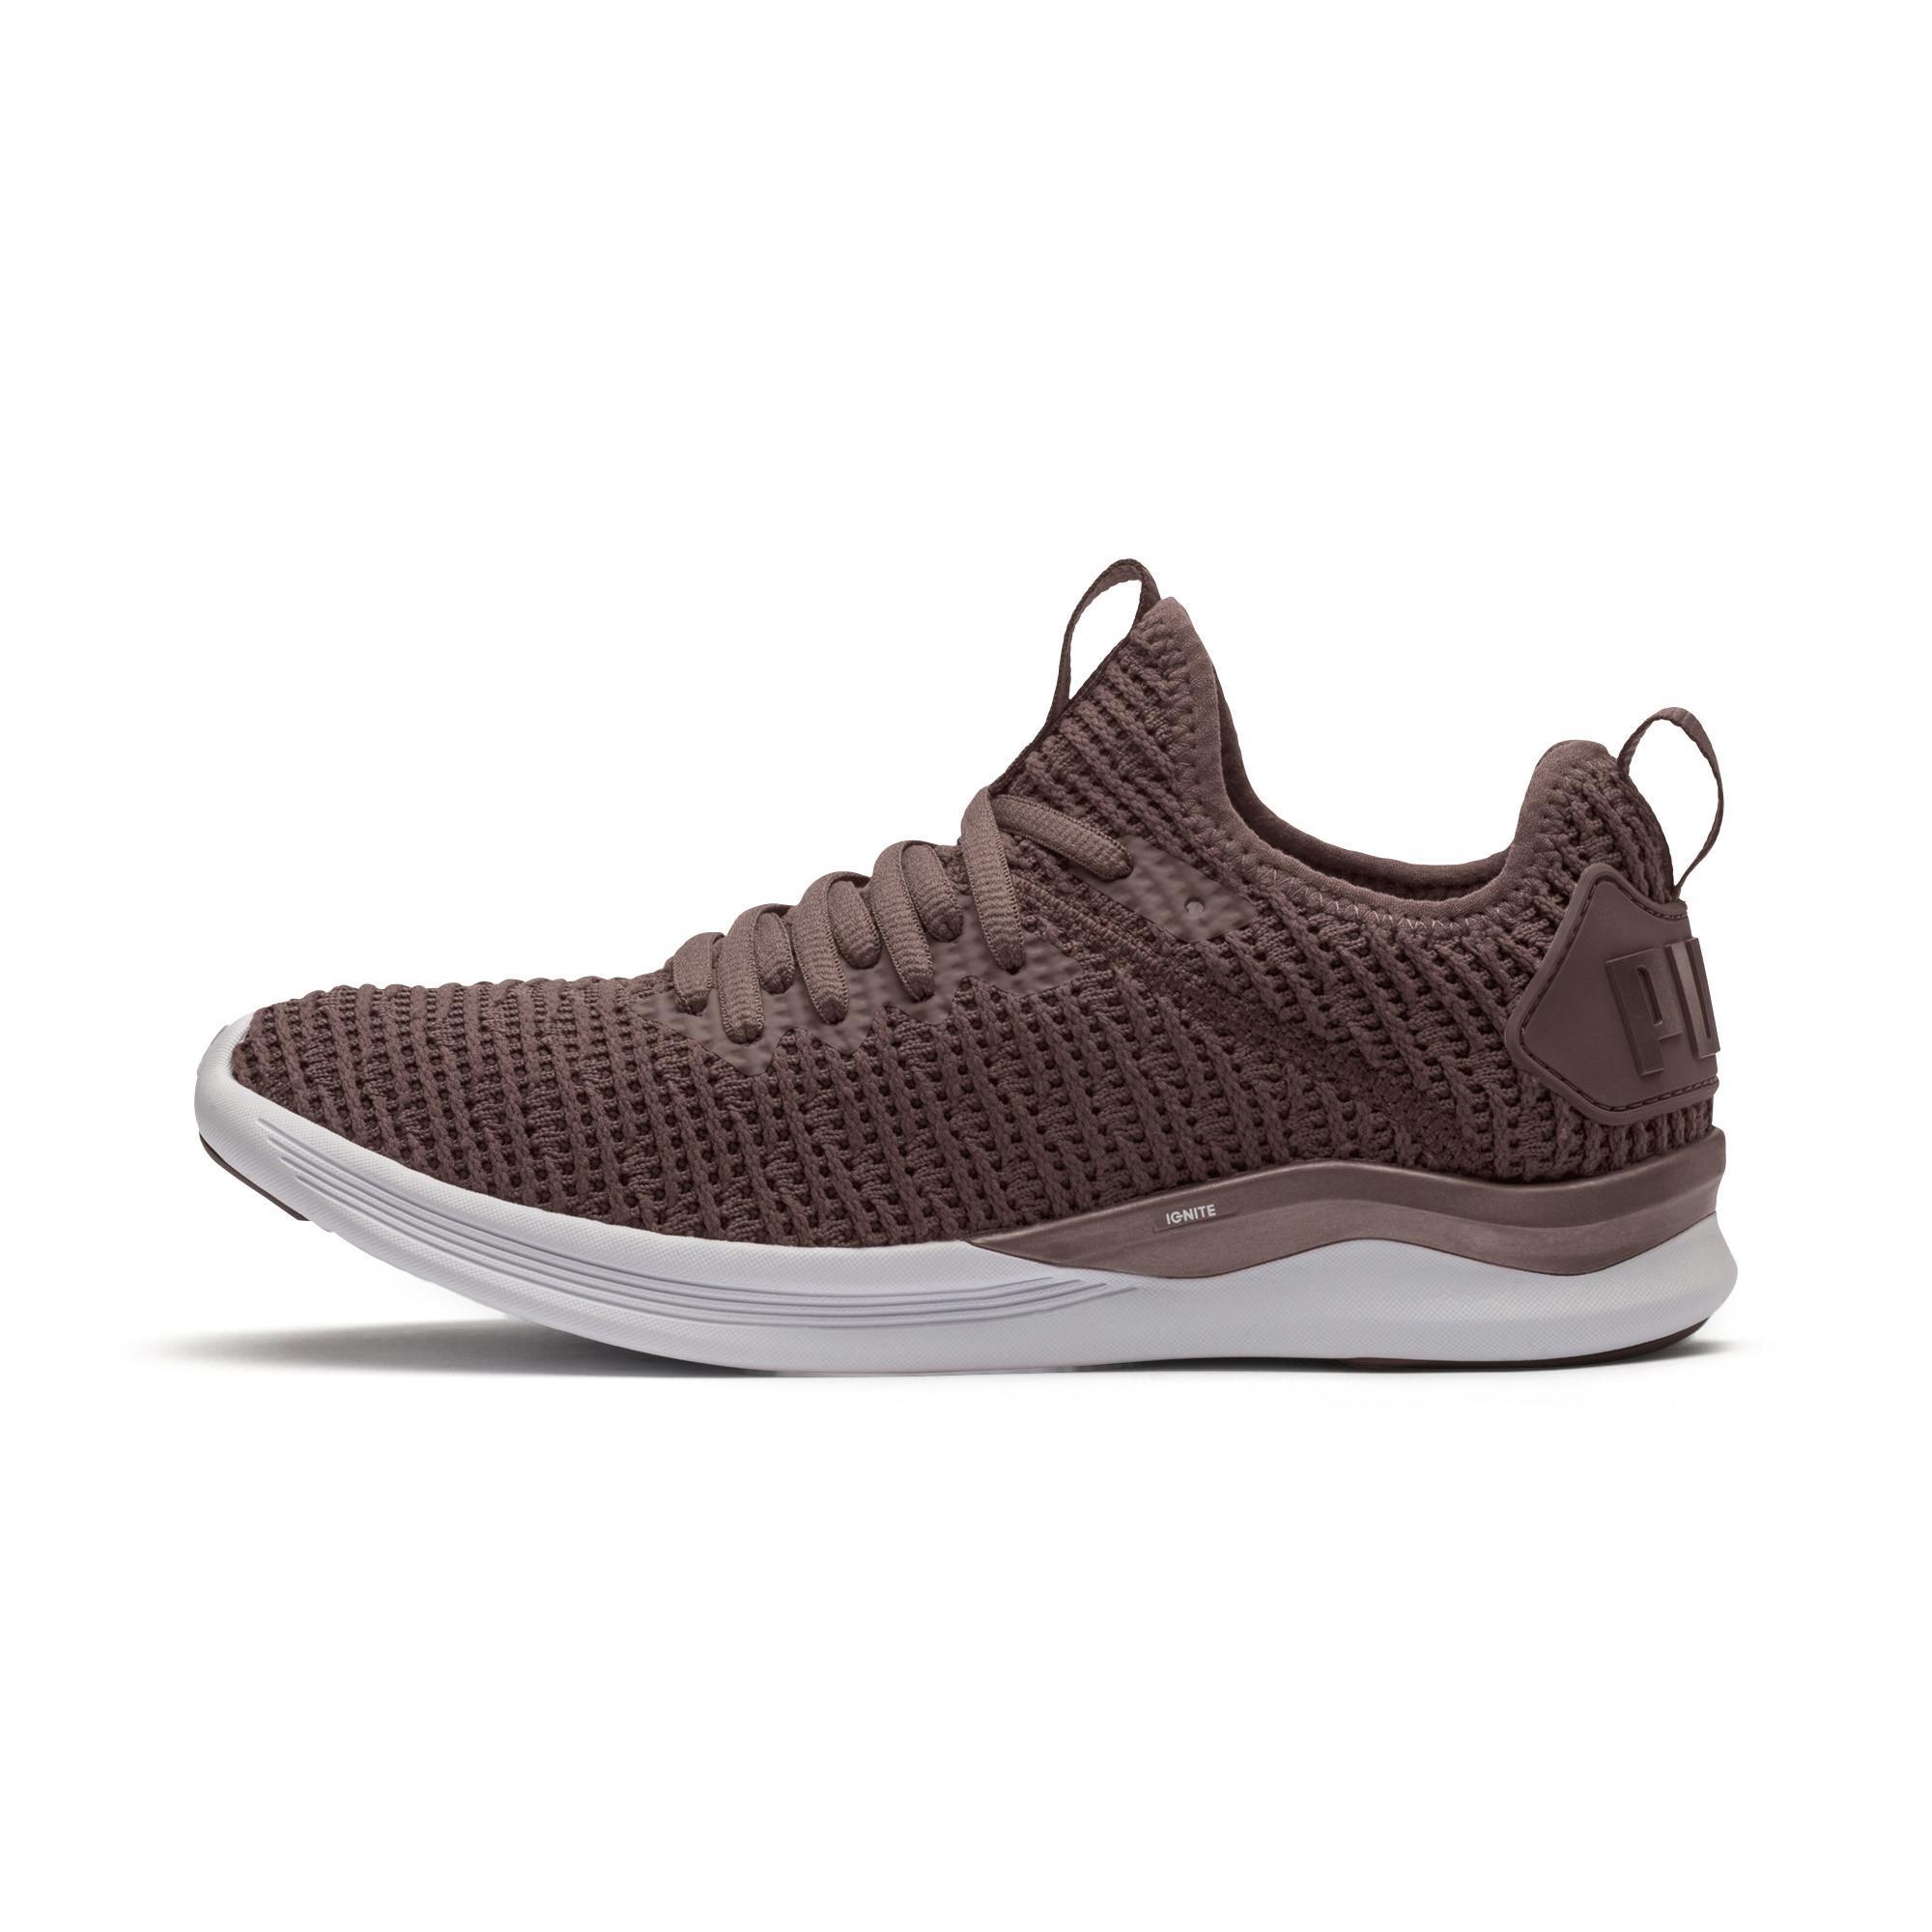 41ea1de699b0 Lyst - PUMA Ignite Flash Luxe Women s Running Shoes in Brown for Men